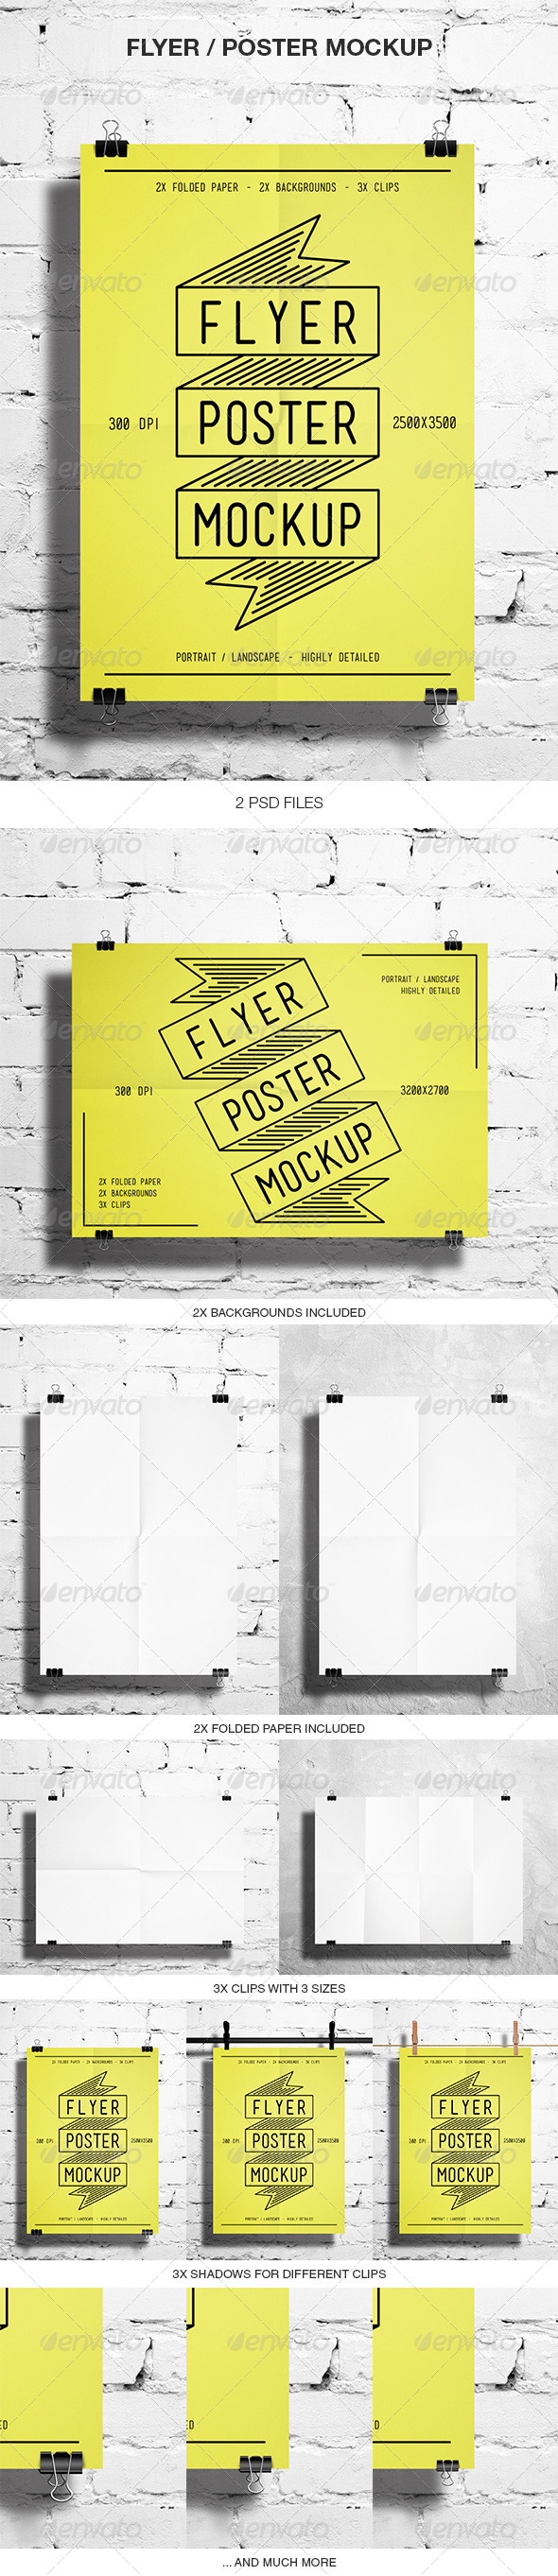 GraphicRiver Flyer Poster Mockup 5530803